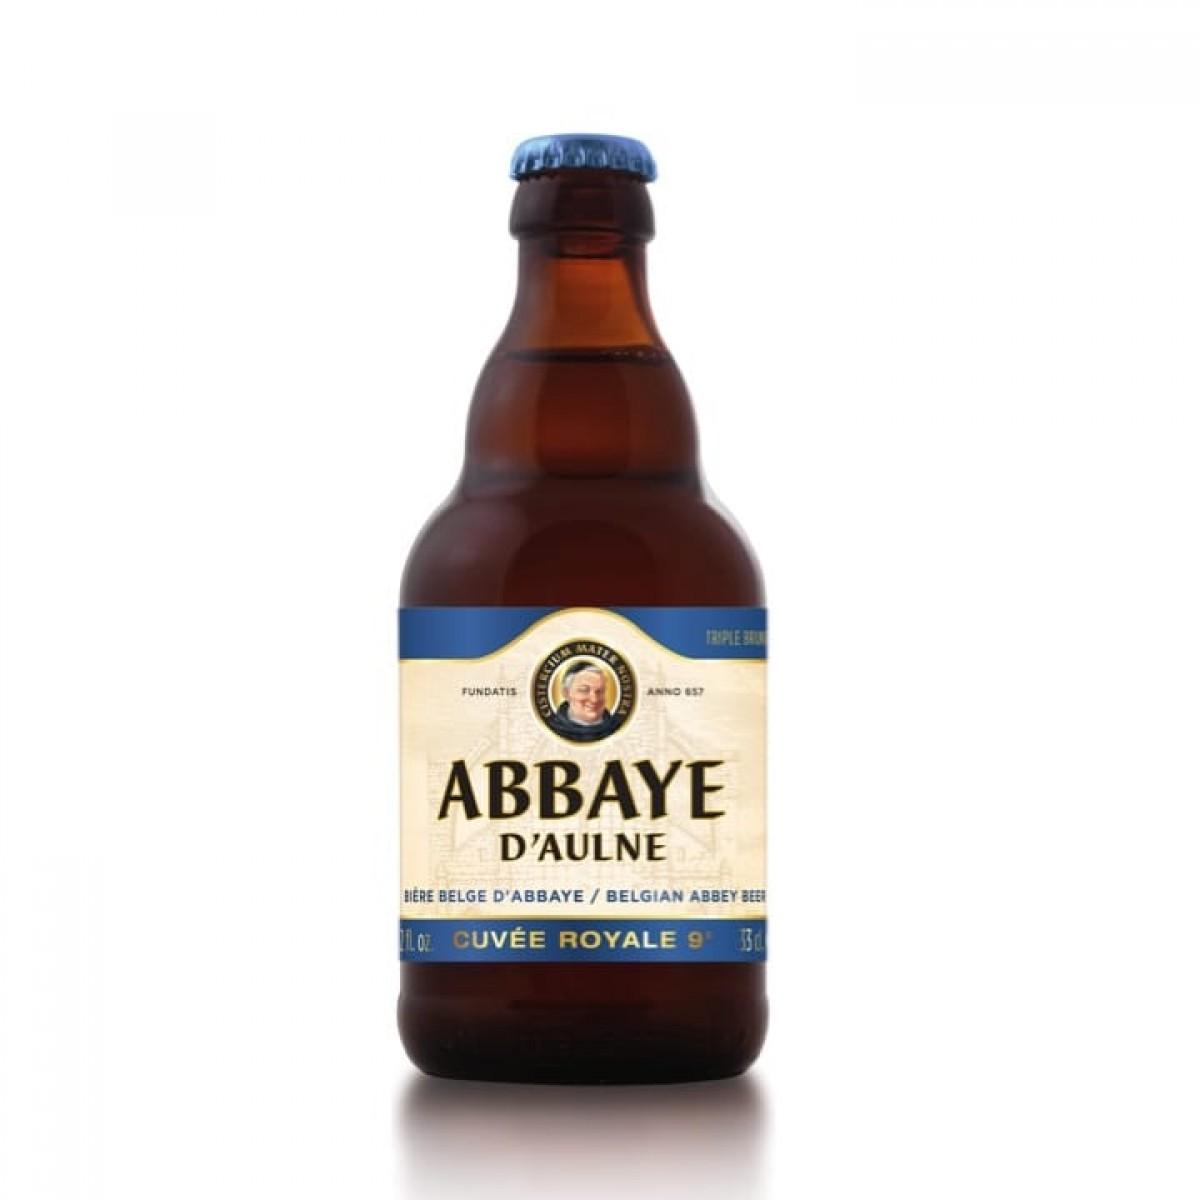 Bia Abbaye d'Aulne Cuvee Royale 9%-Chai 330ml